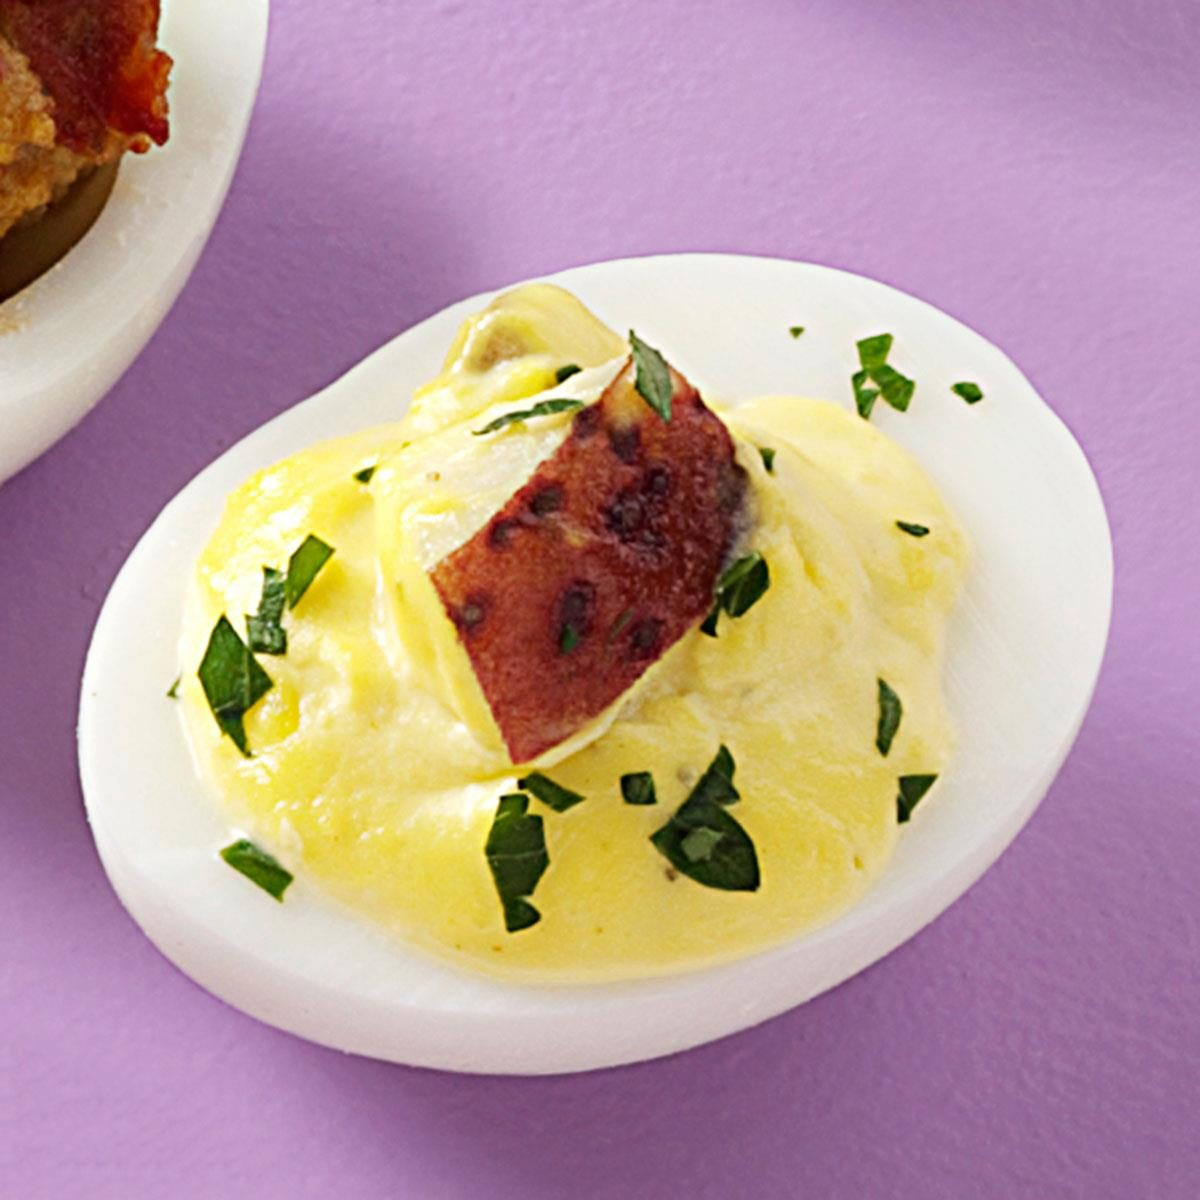 Tater Salad Deviled Eggs